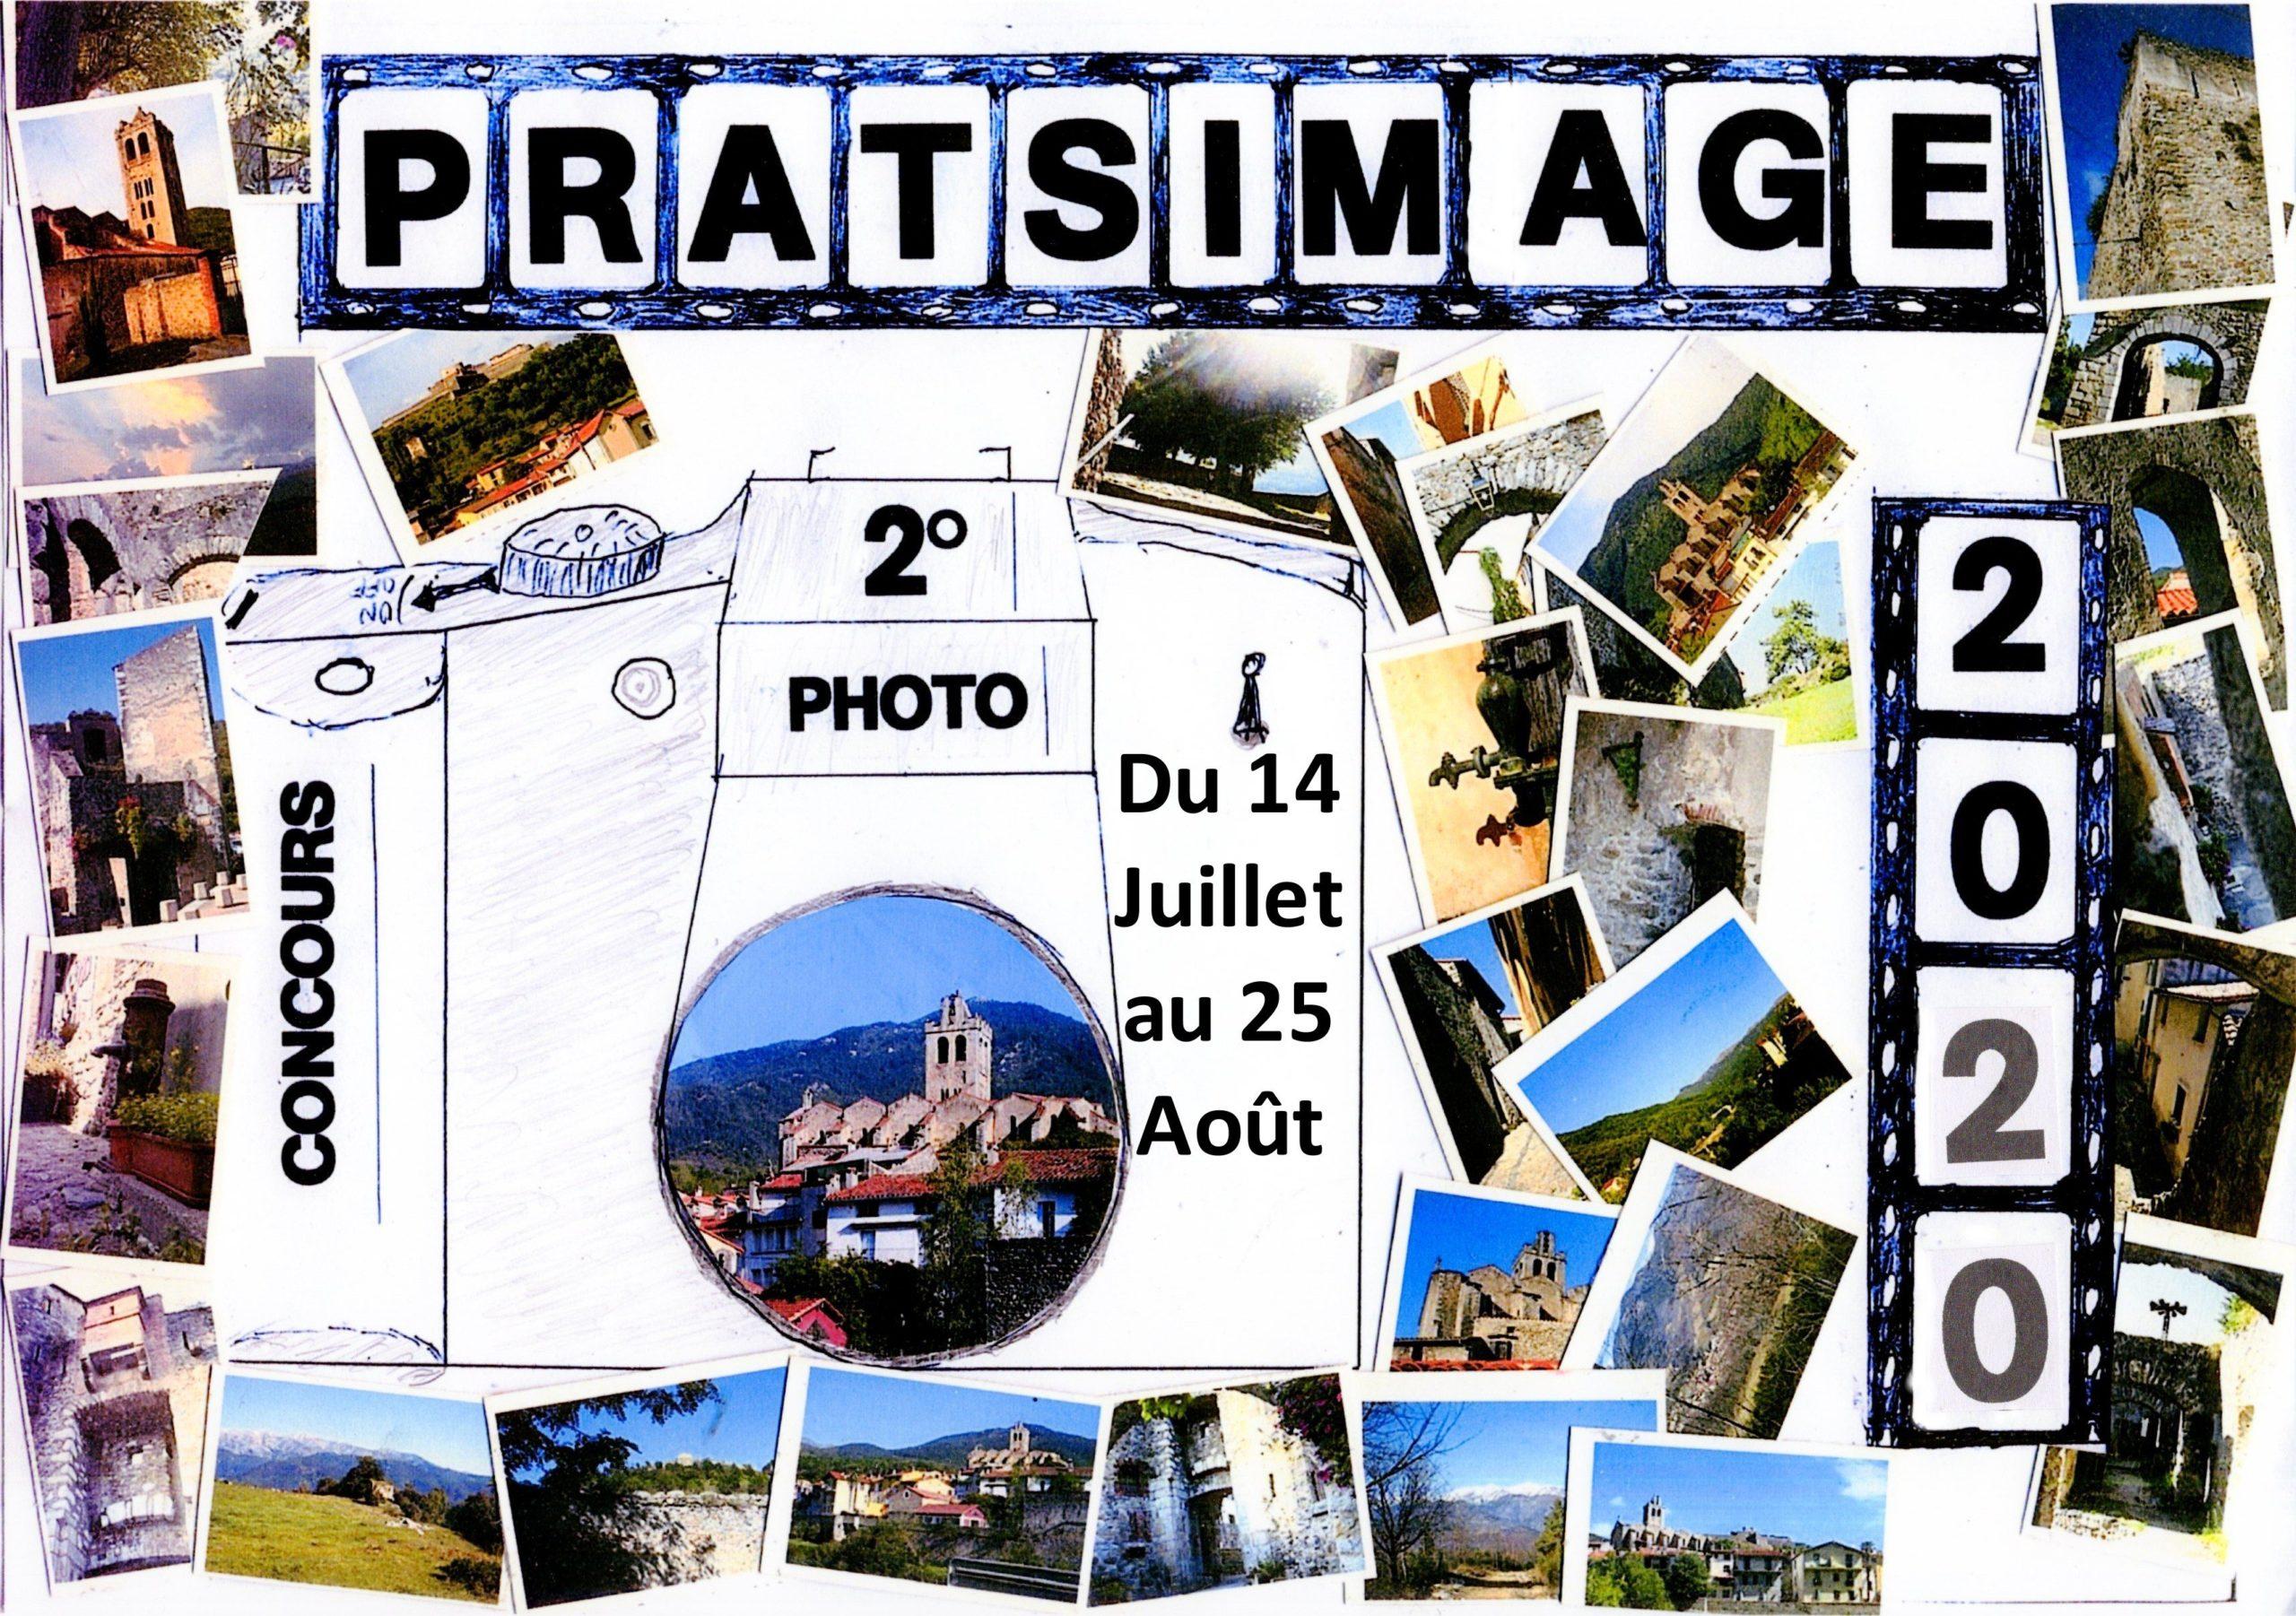 Concours photos PratsImage